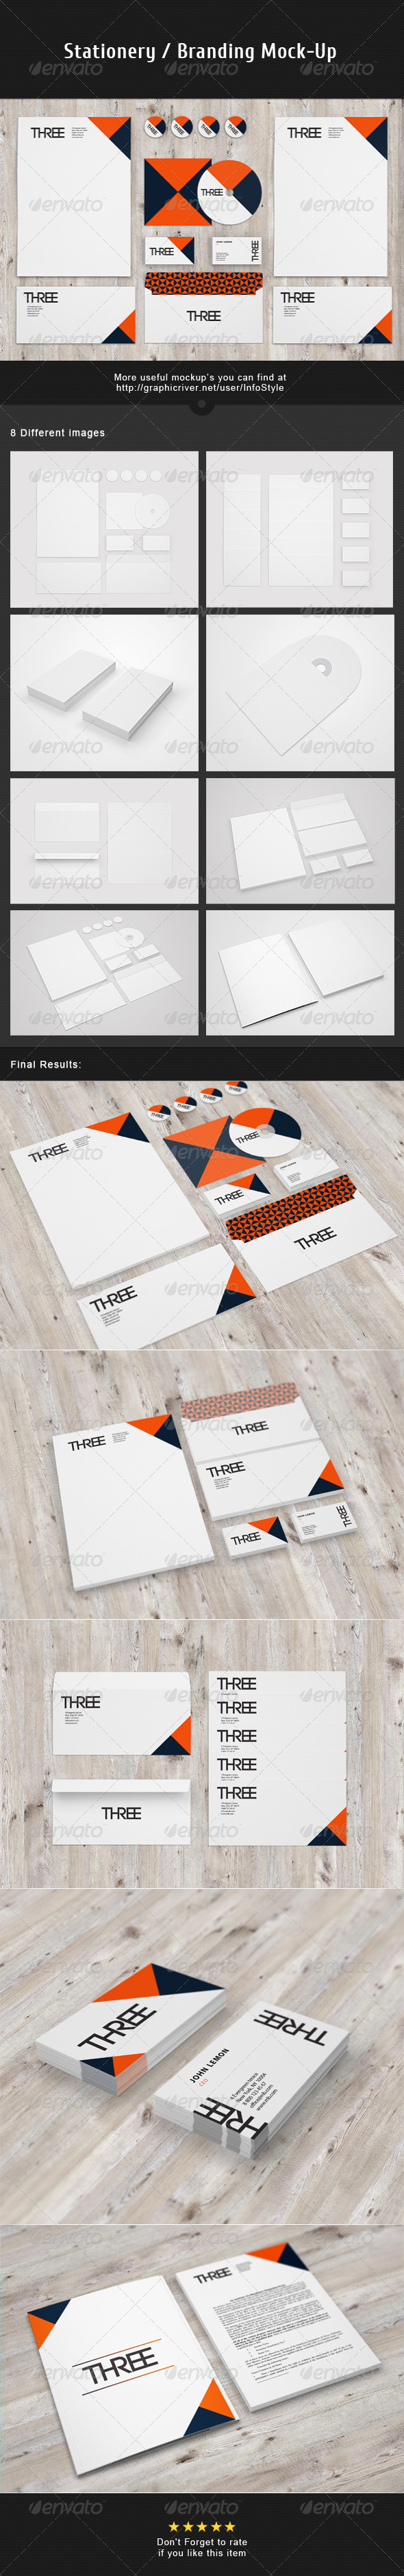 GraphicRiver Stationery Branding Mock-Up Vol.3 3386684